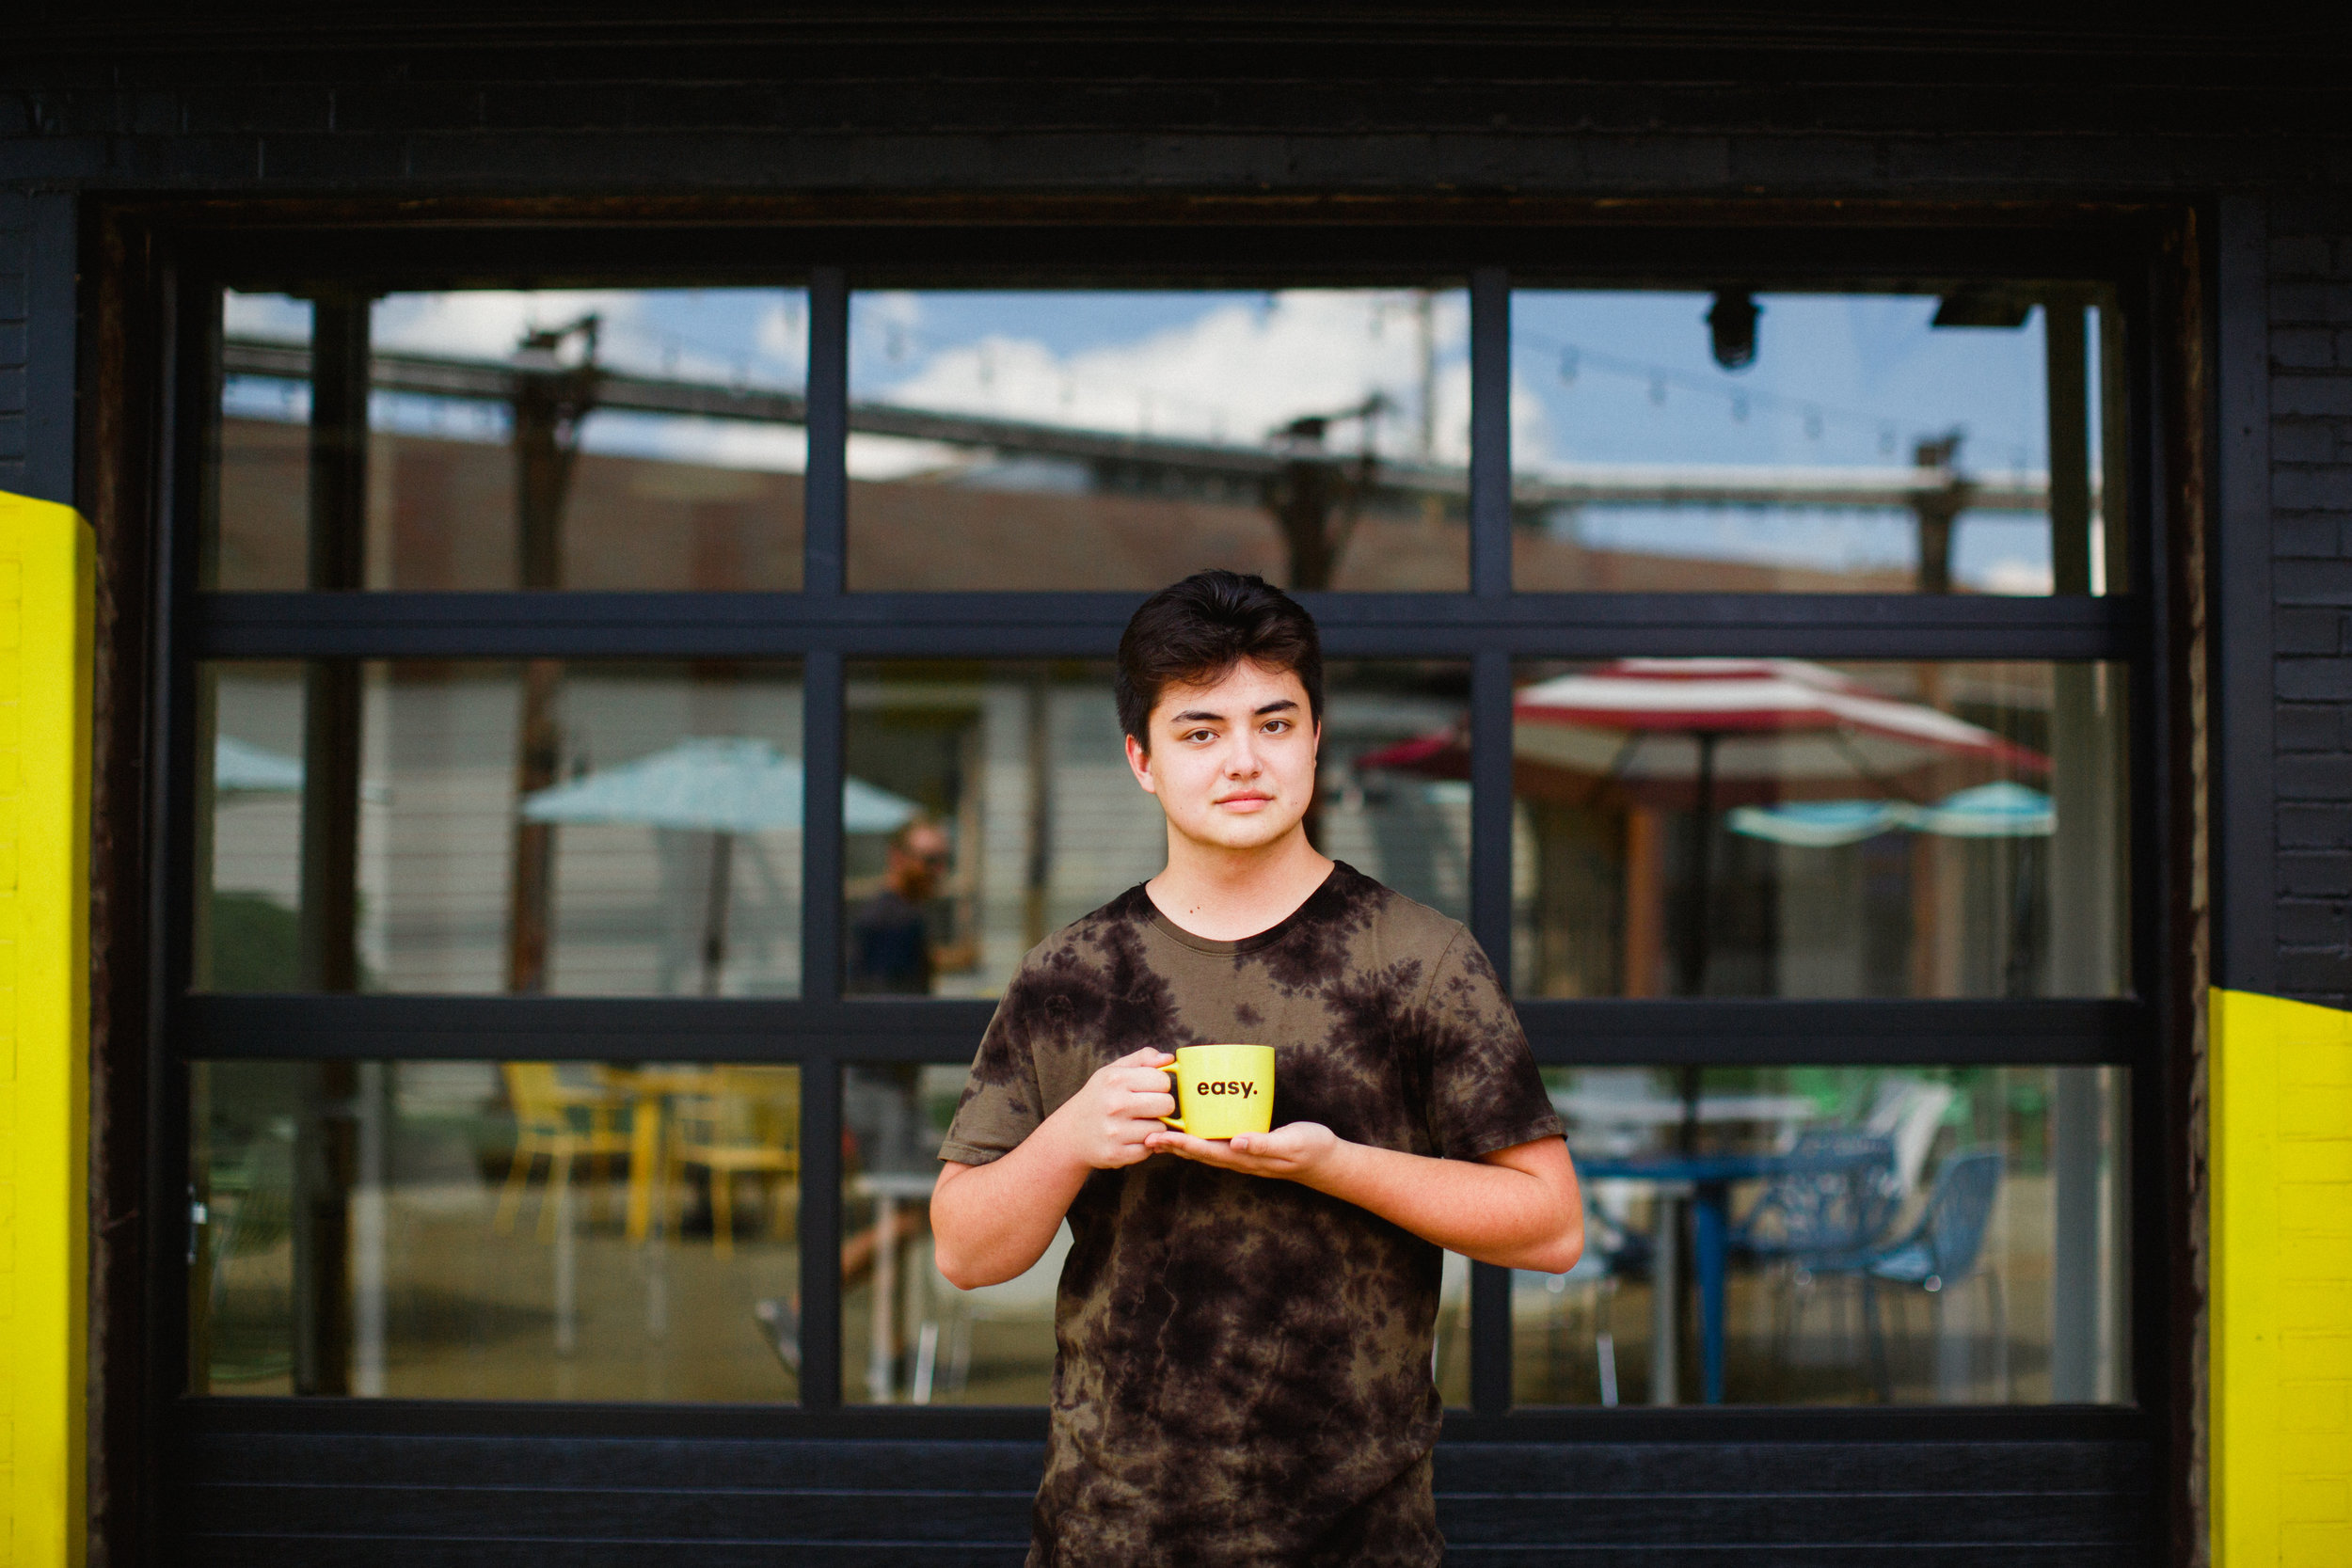 that's me holding a coffee mug.